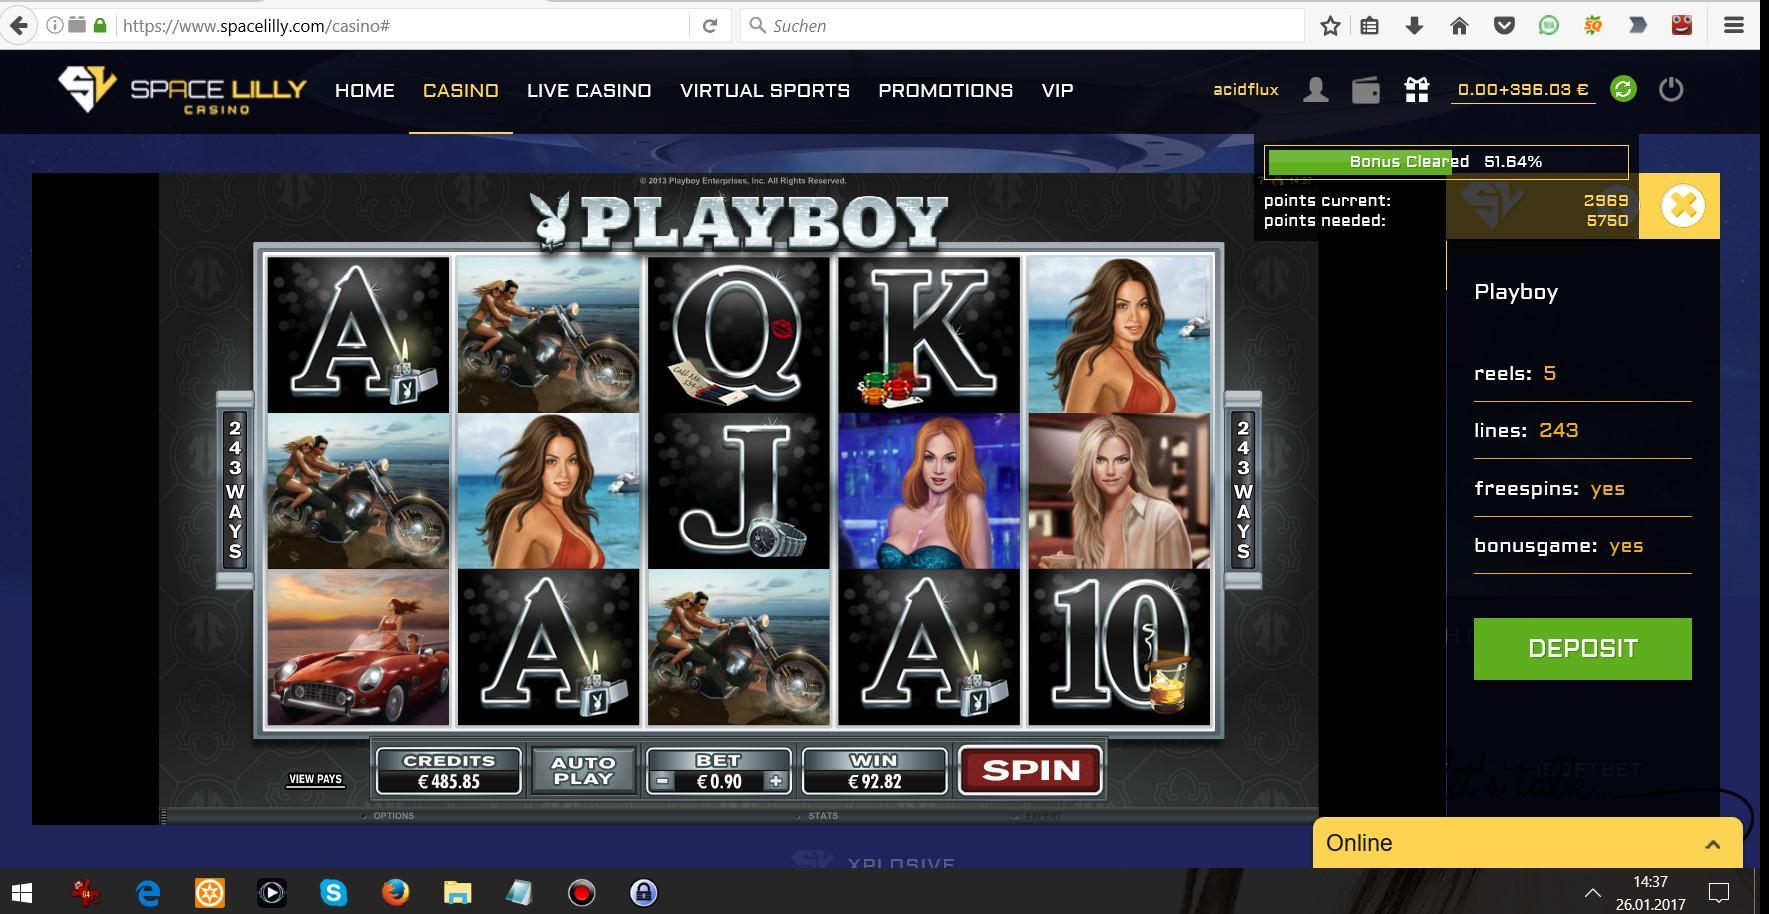 26.01.2017 - 14:37 (GMT+1) Playboy Online Slot